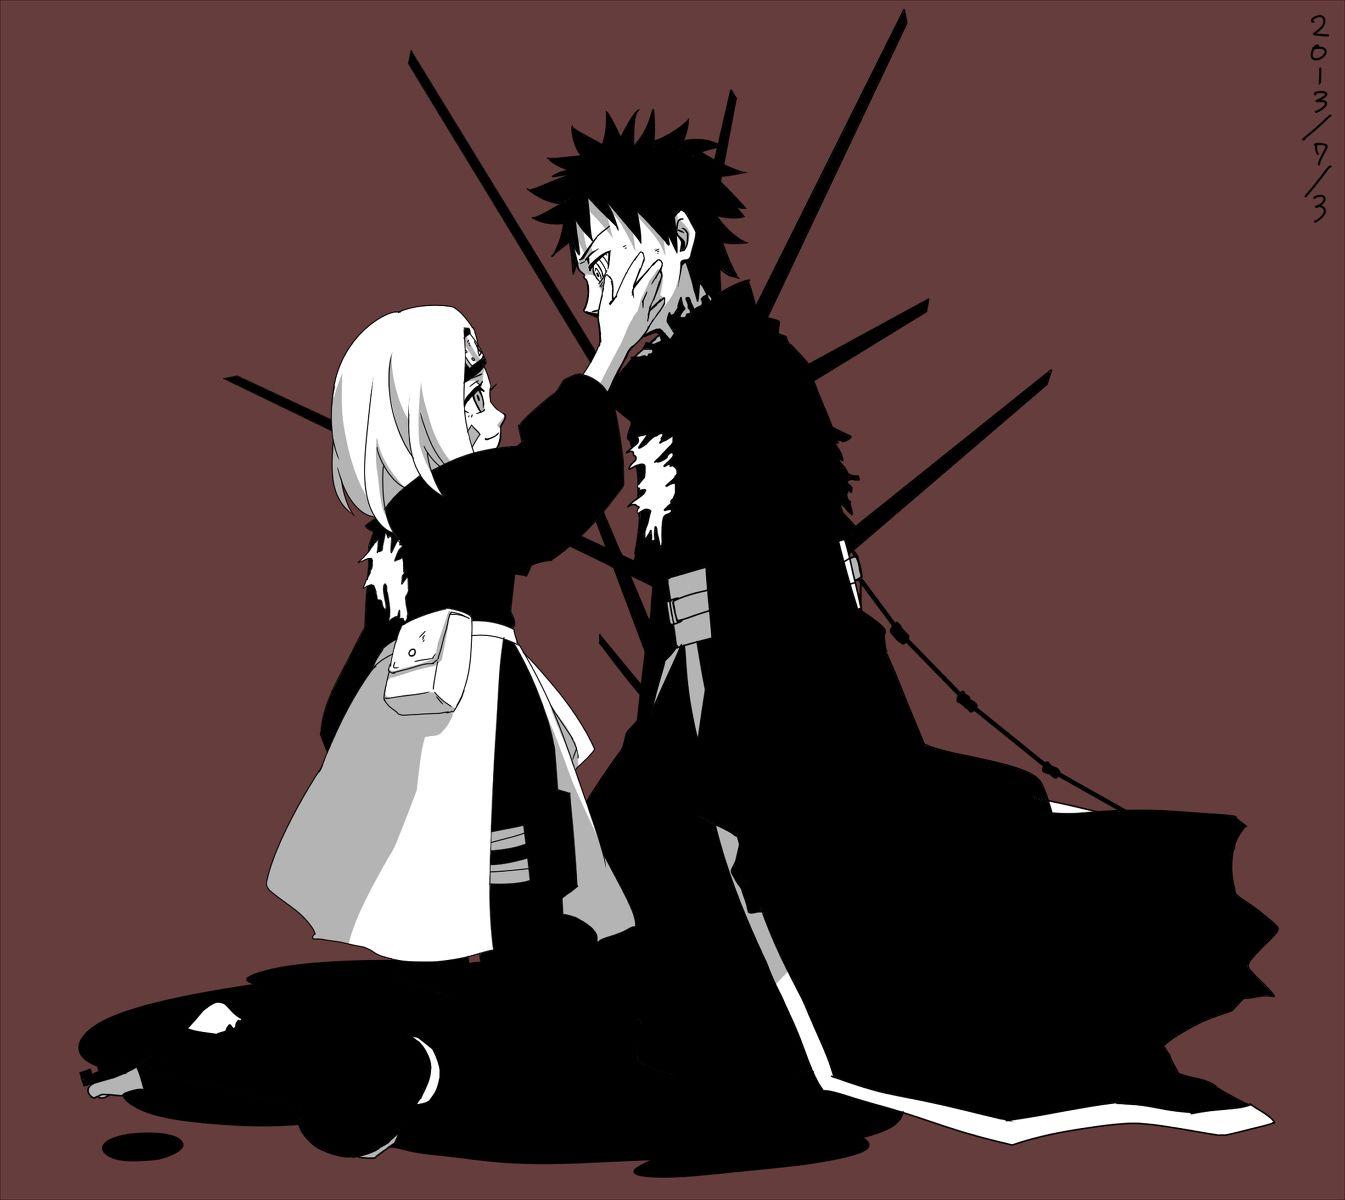 Obito and Rin | NaRuTo | Pinterest | Naruto, Naruto ...